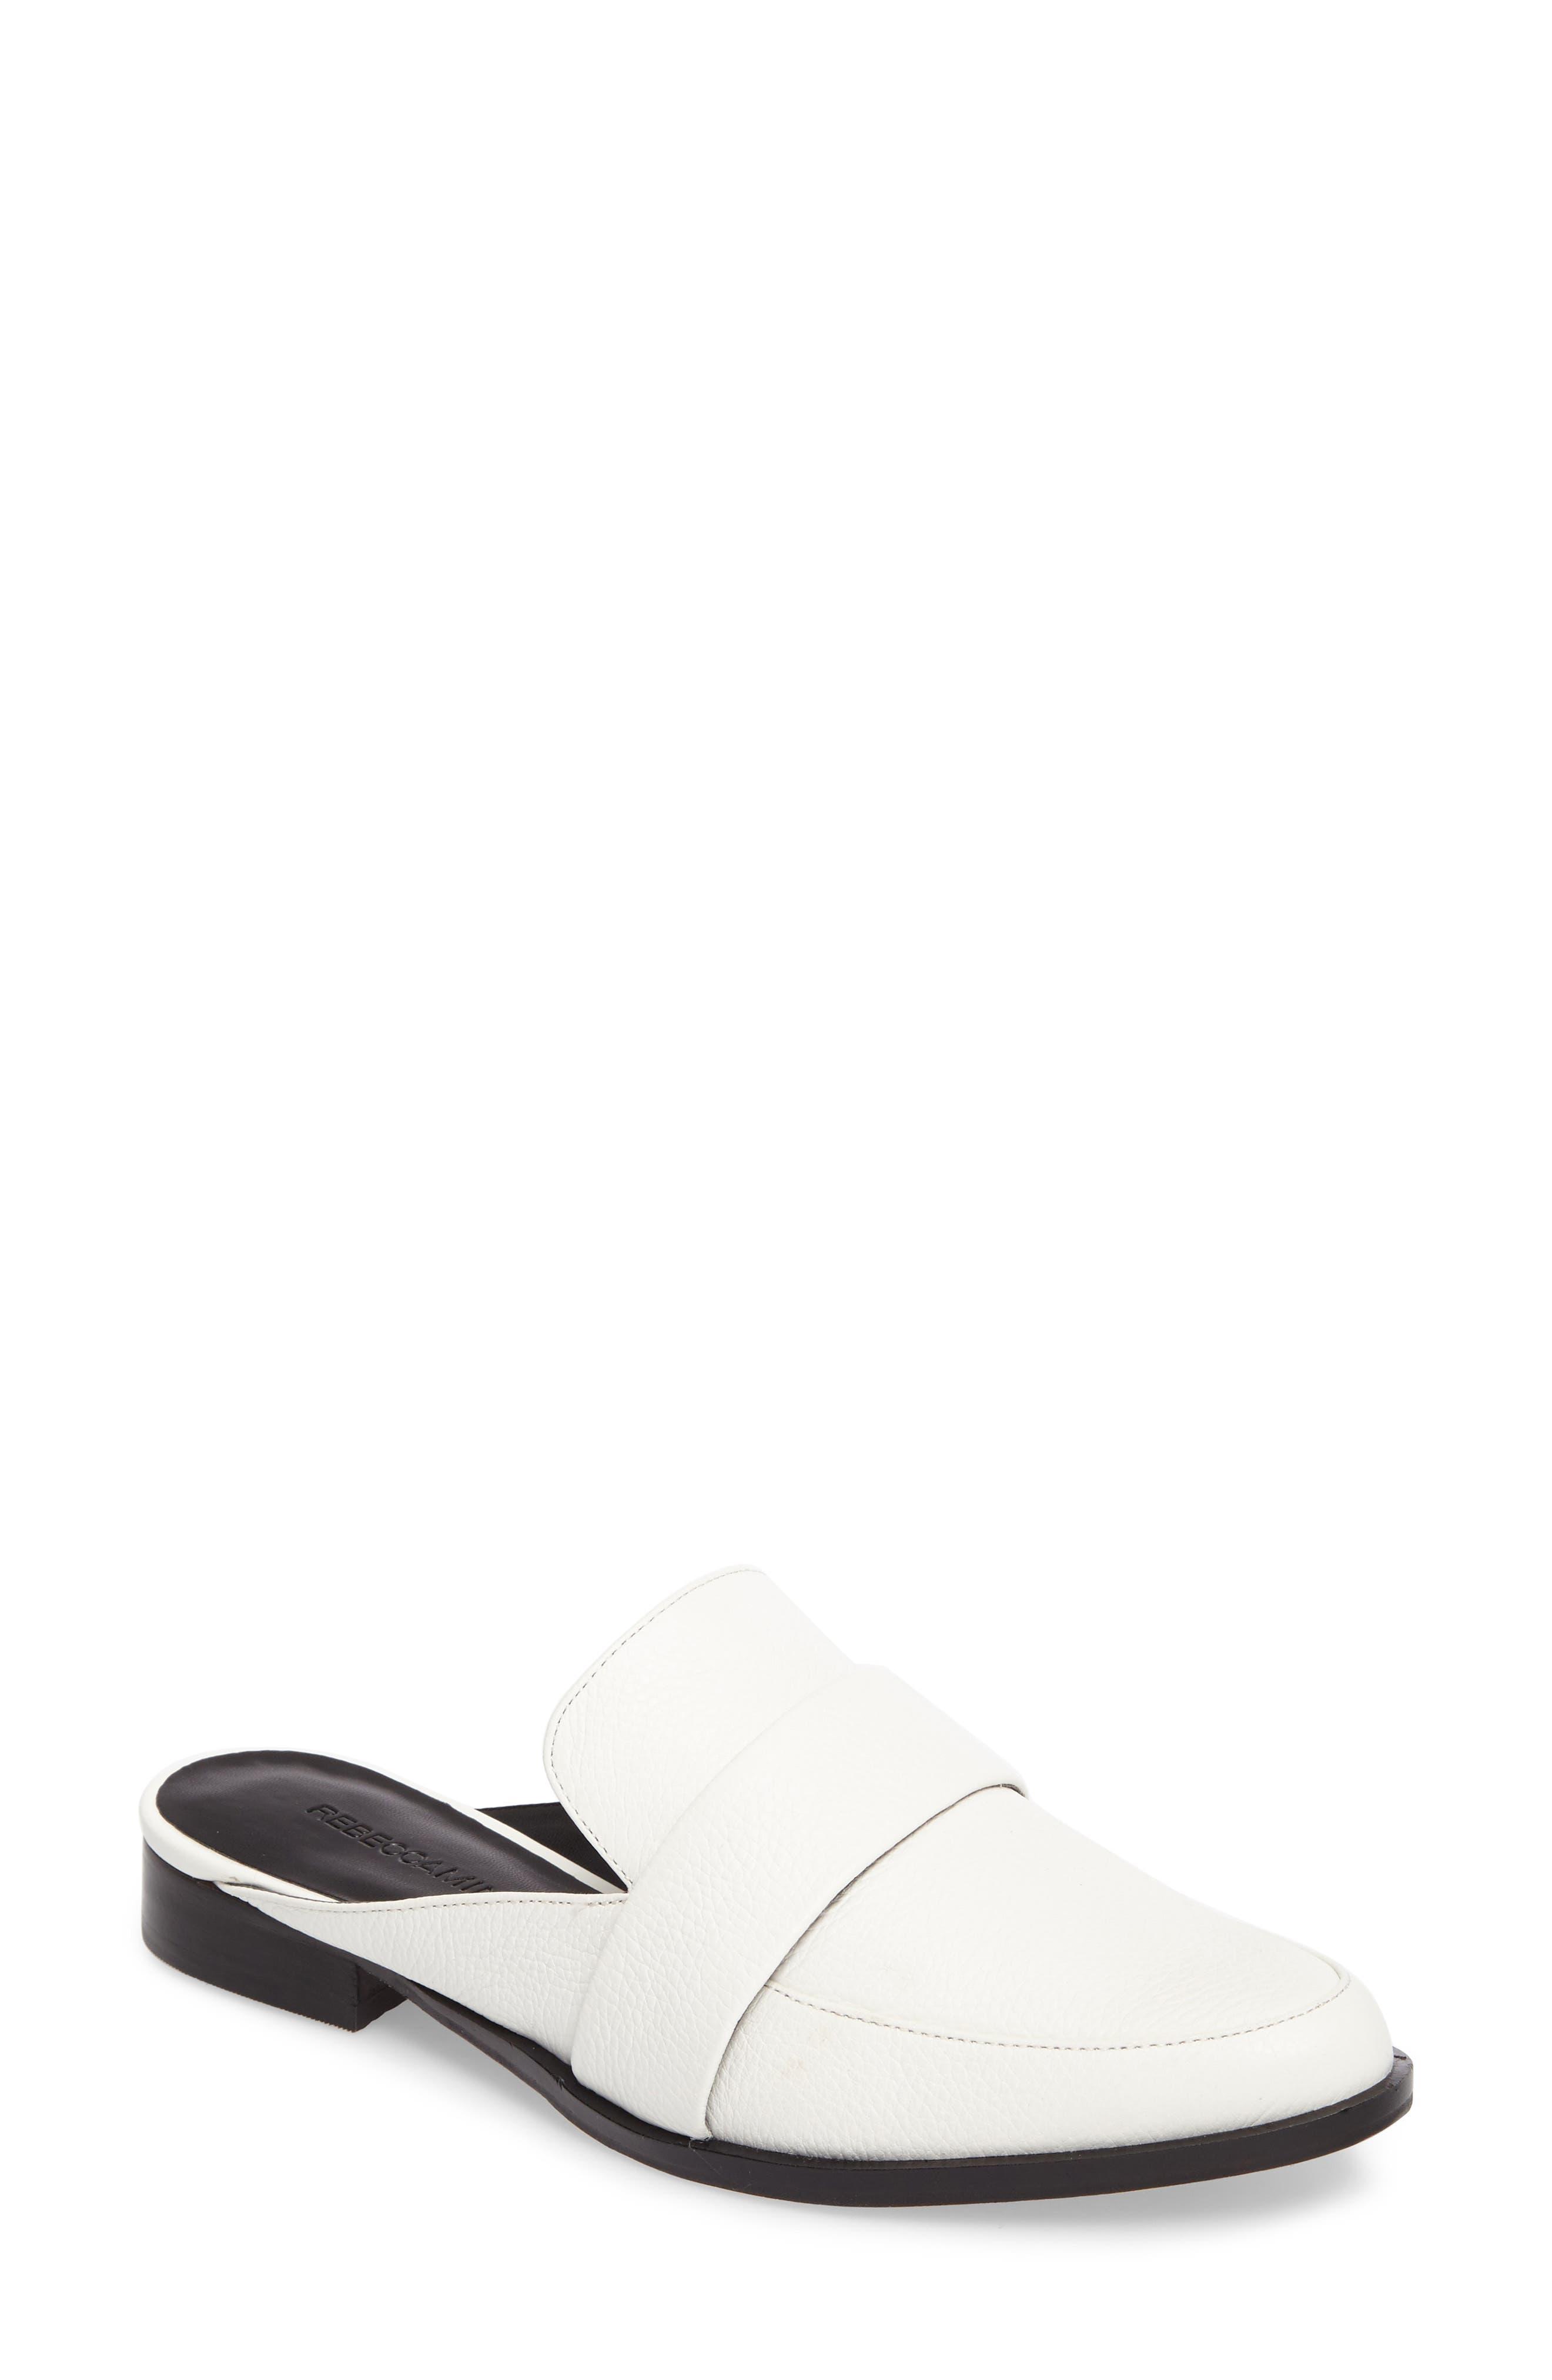 'Mika' Mule,                             Main thumbnail 1, color,                             White Leather